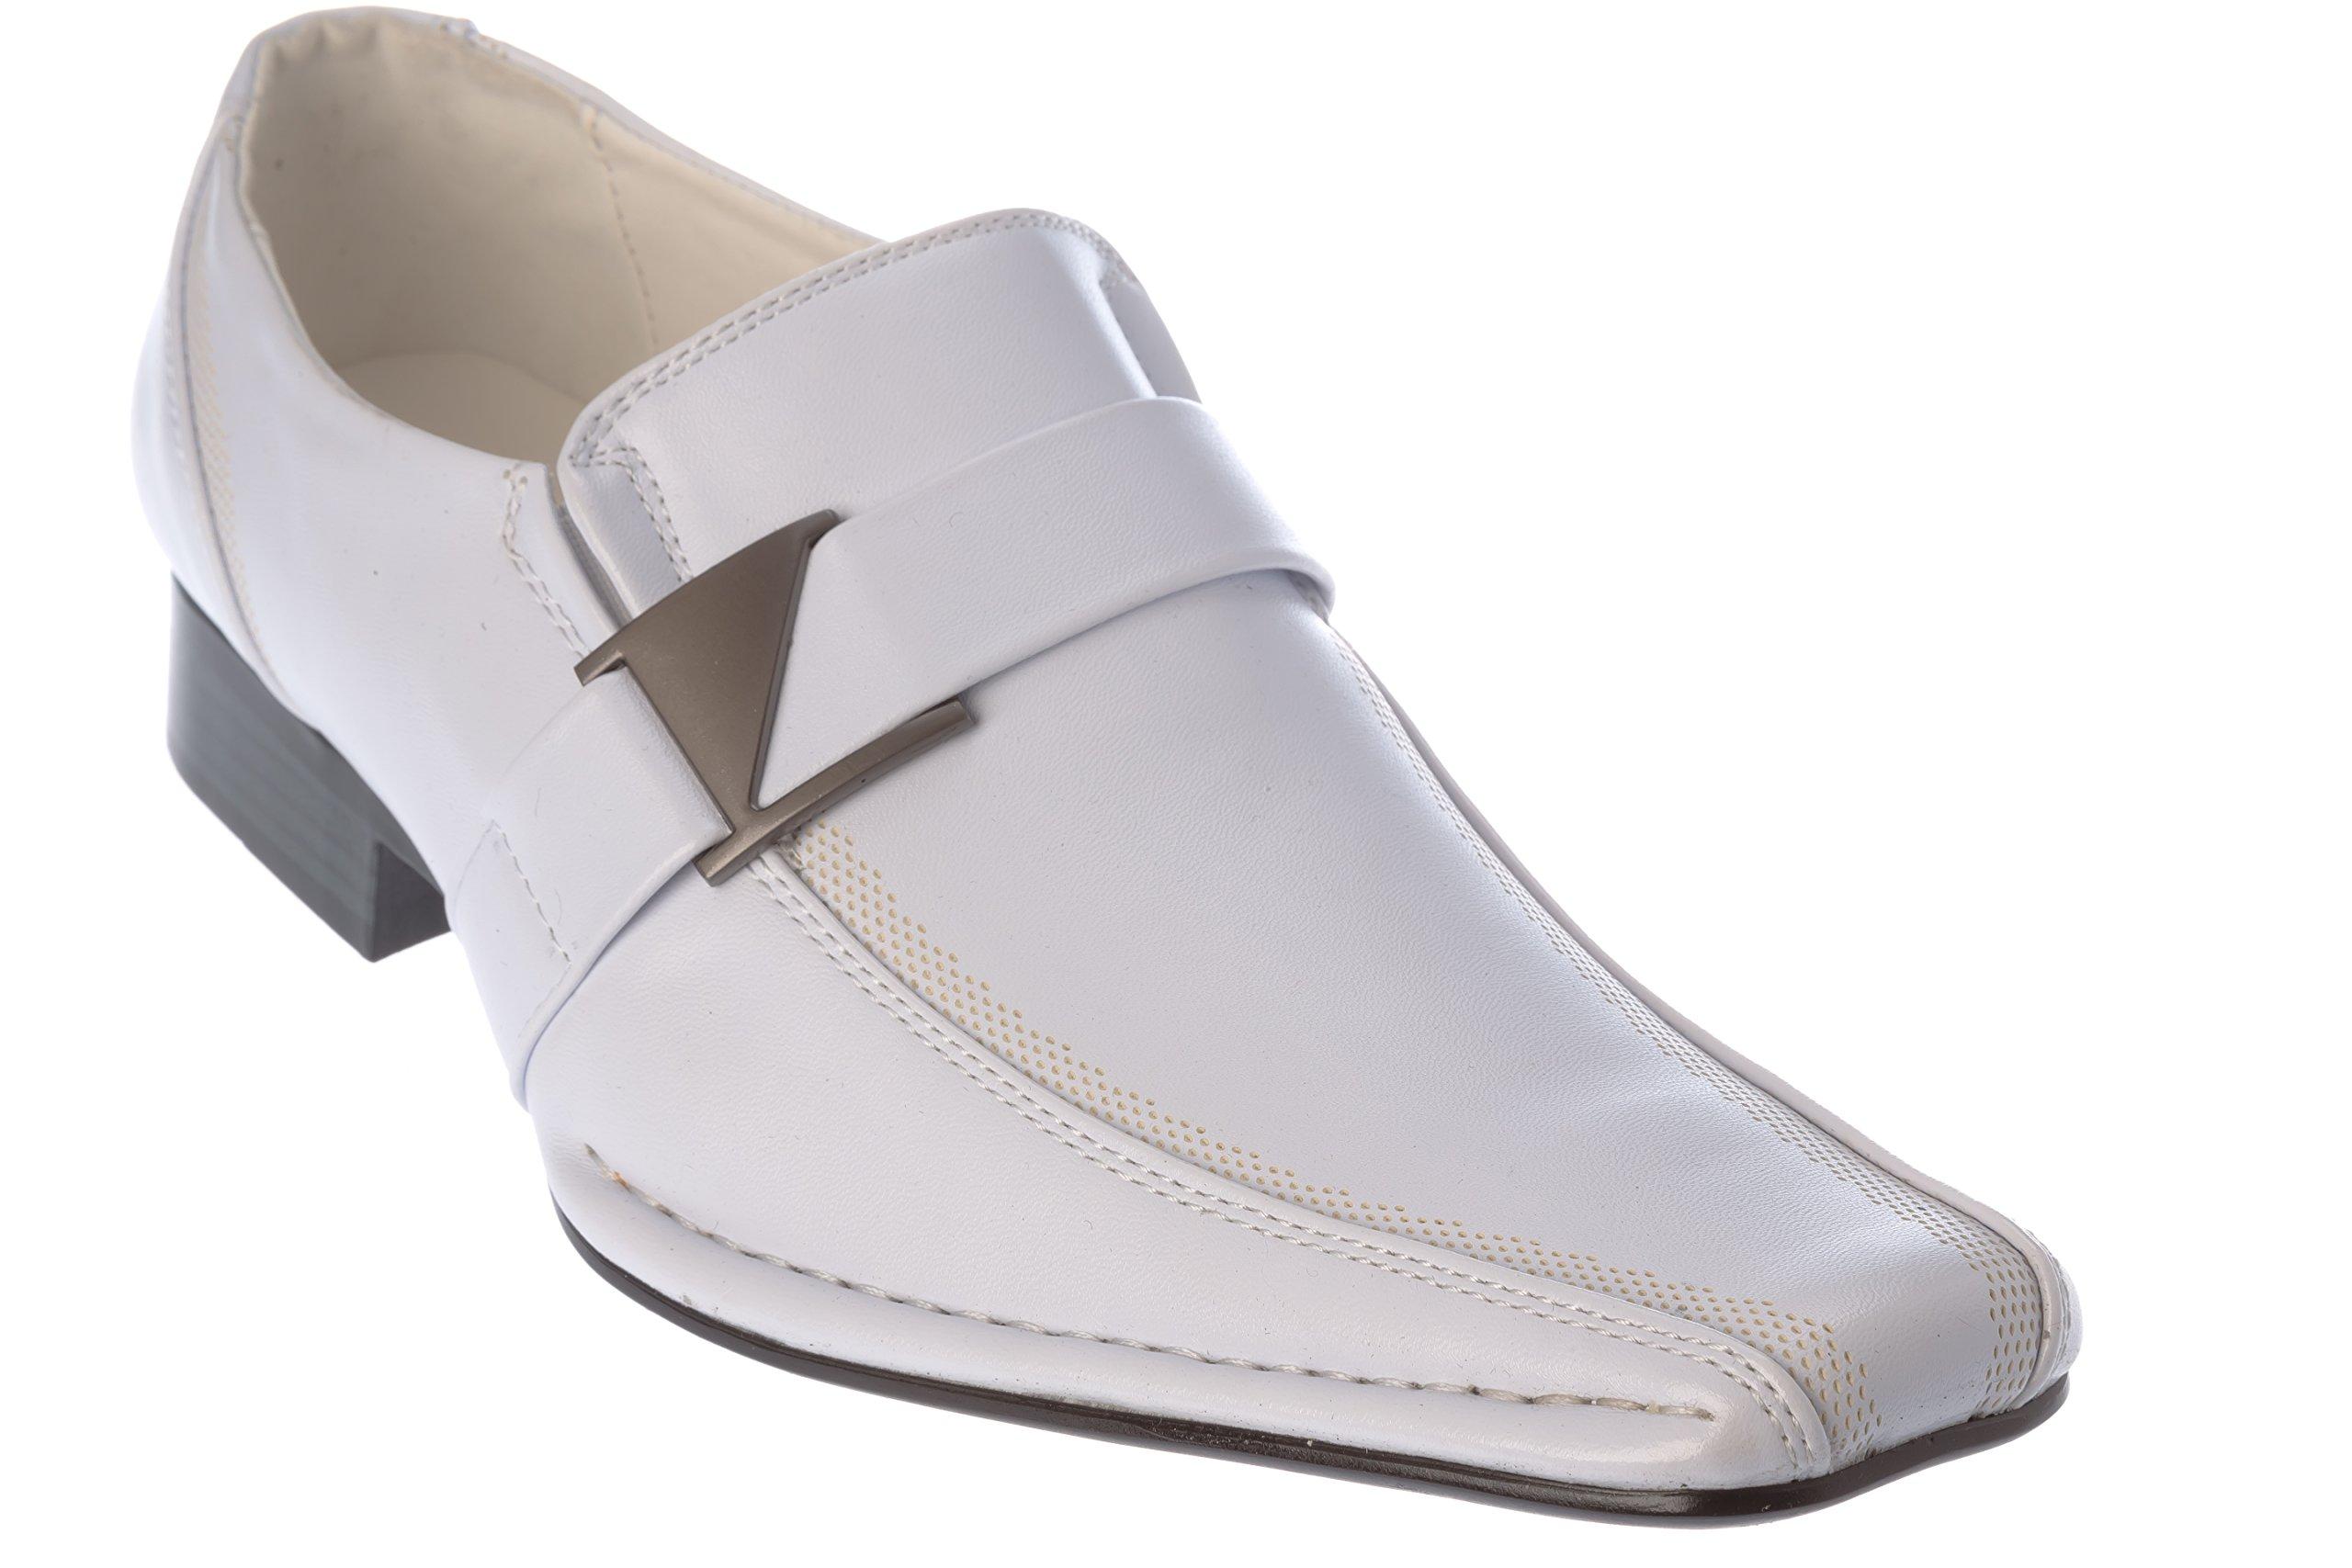 Santoni Mens Slip-On Loafer White Dress-Shoes Size 12